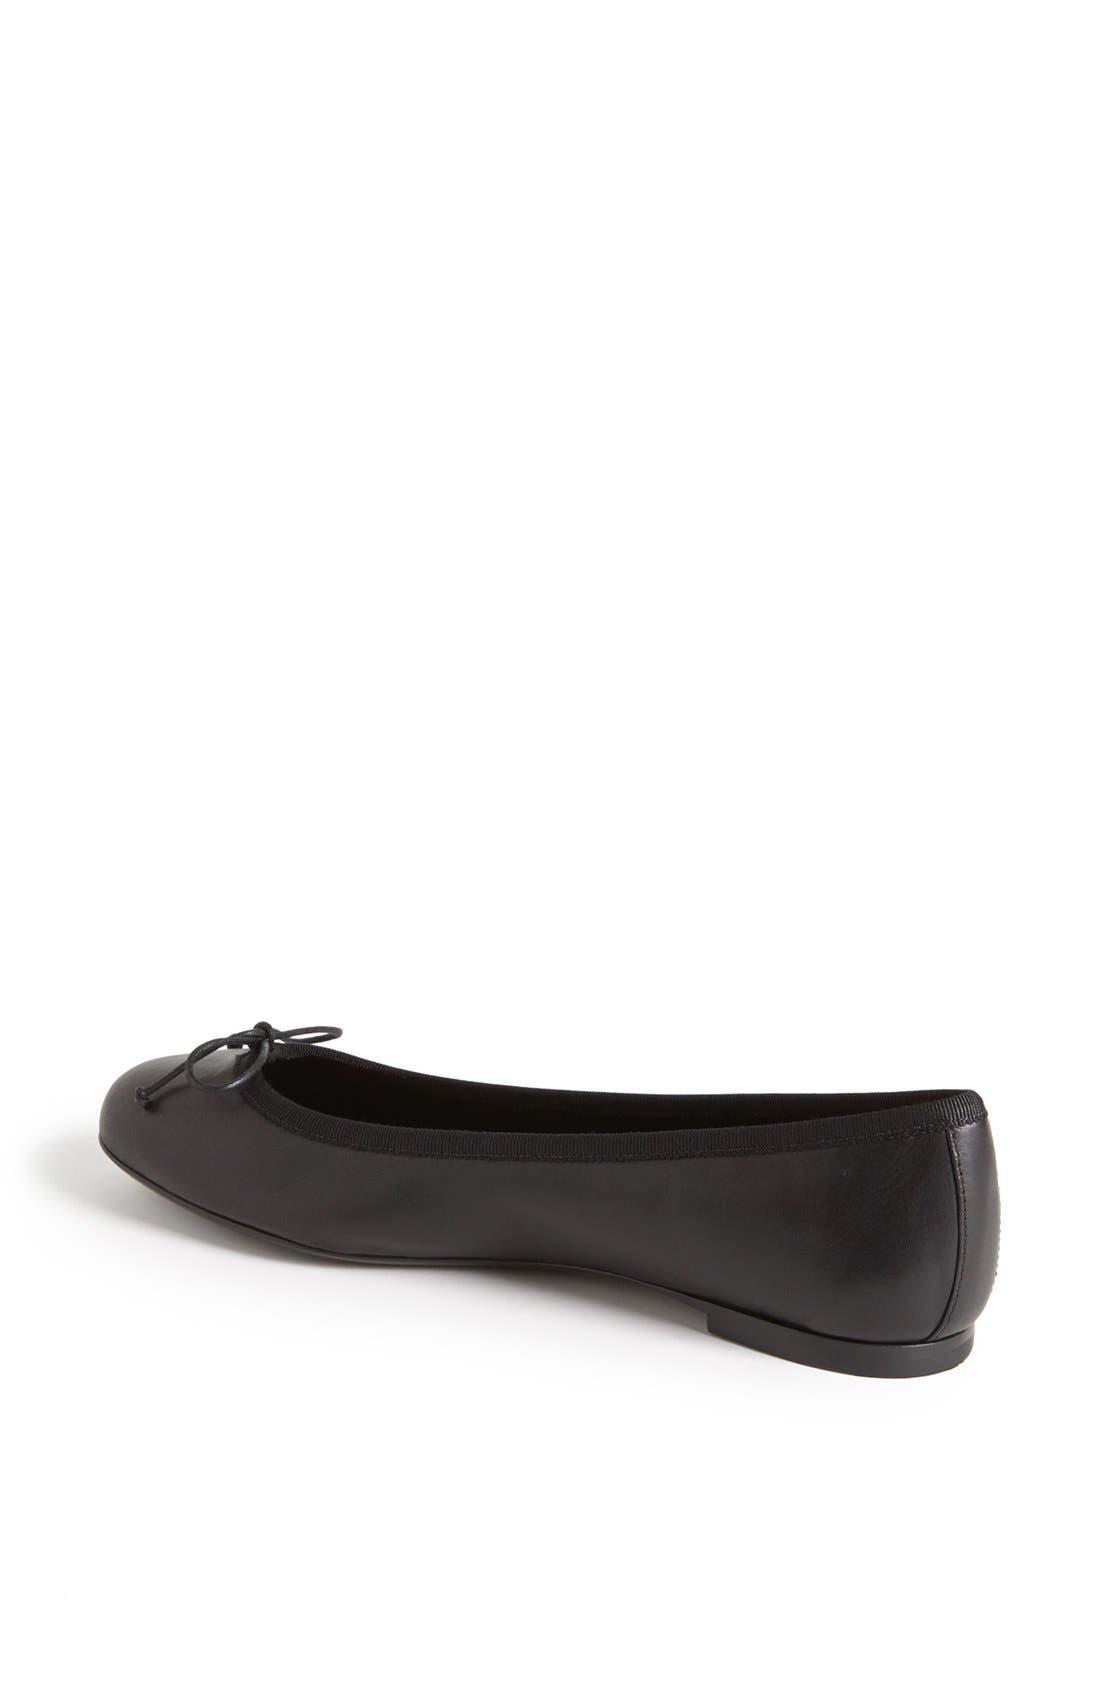 Alternate Image 2  - Saint Laurent 'Dance' Leather Ballet Flat